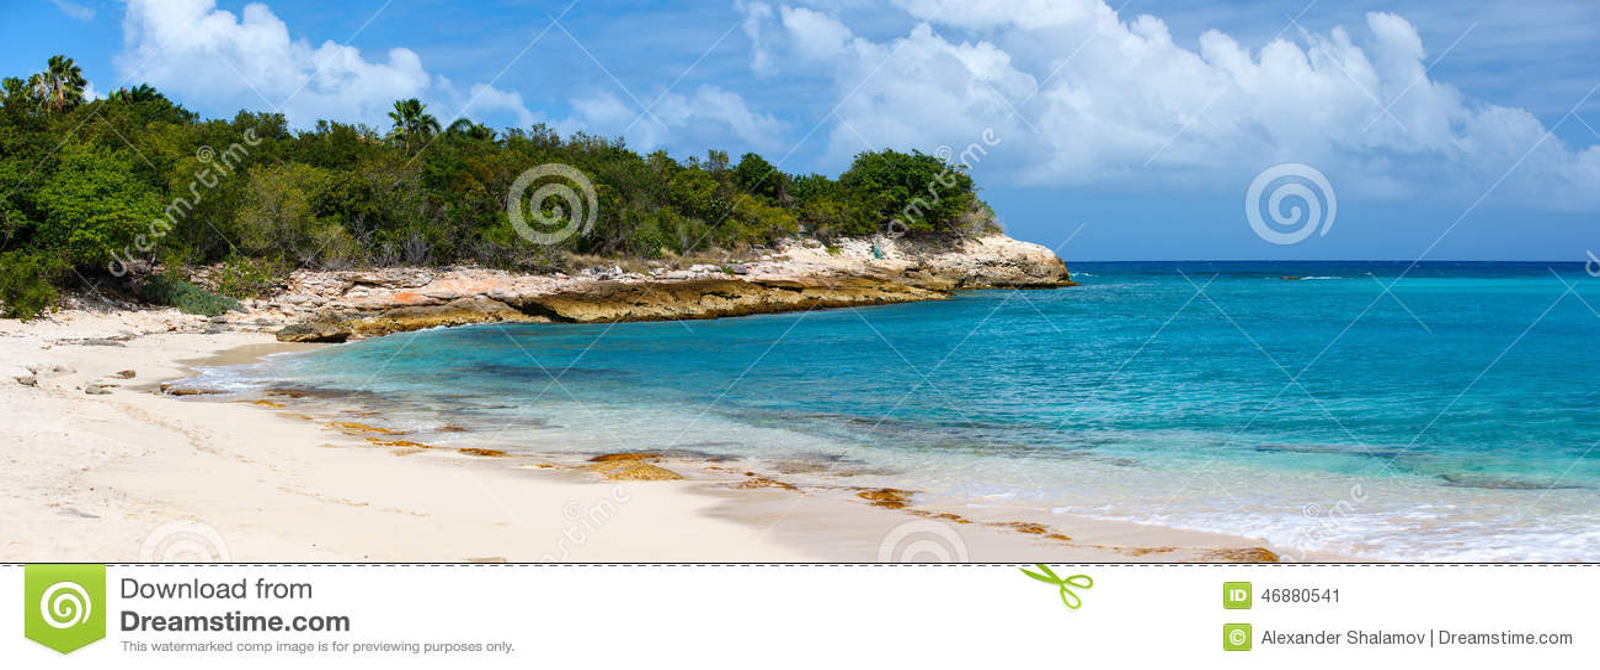 mooi strand op st martin caribbean stock foto afbeelding 46880541. Black Bedroom Furniture Sets. Home Design Ideas